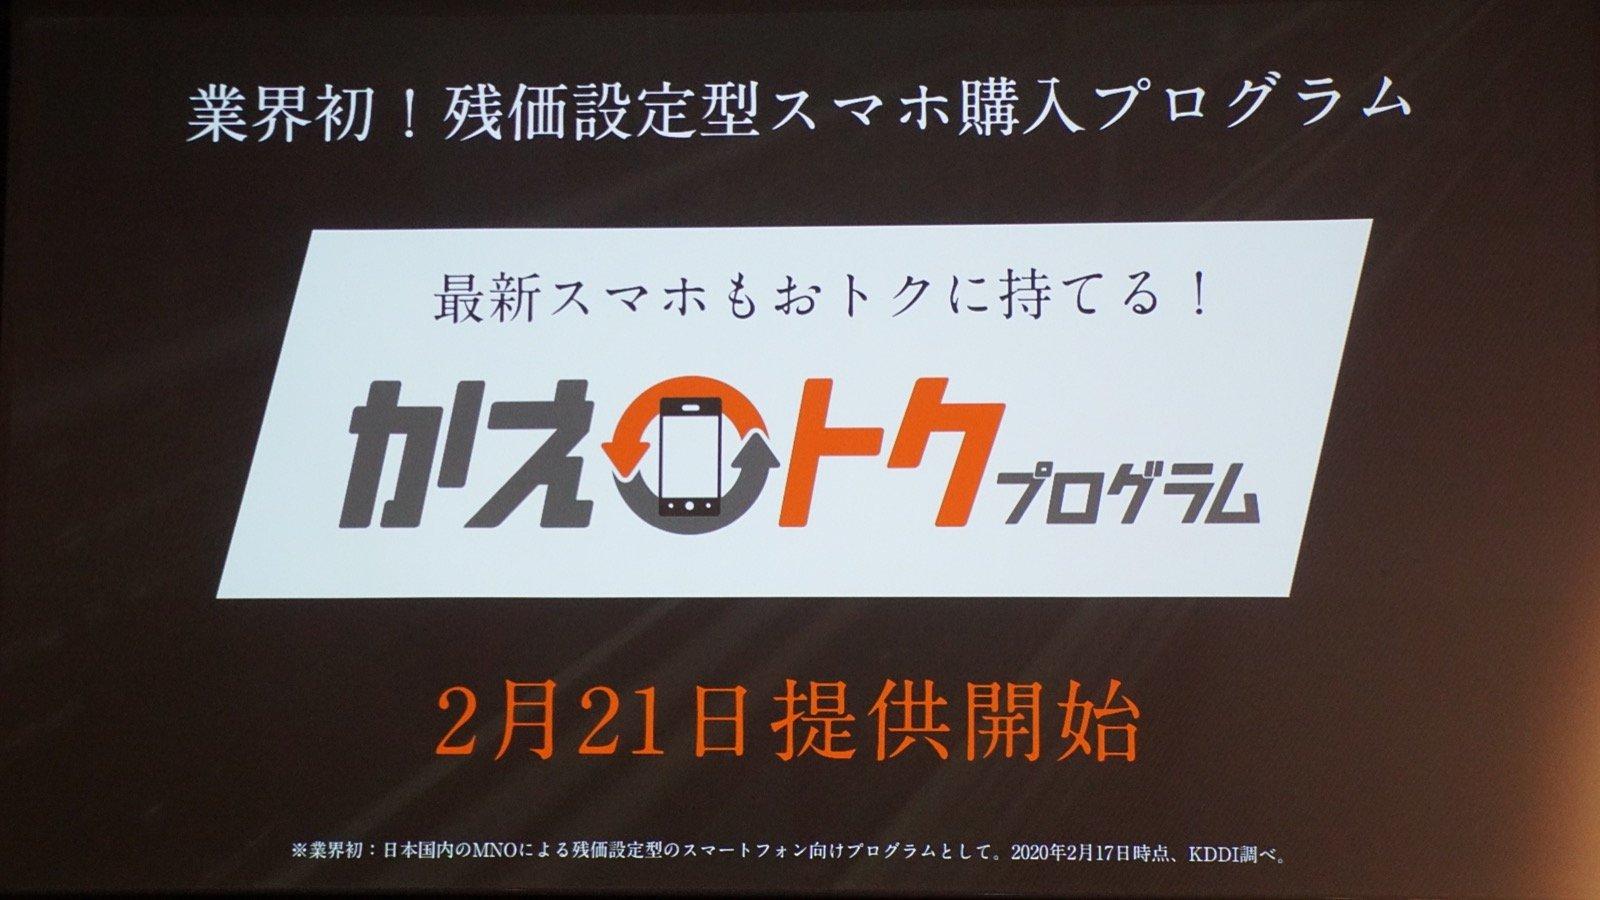 au、業界初の残価設定型スマホ購入プログラム「かえトクプログラム」発表